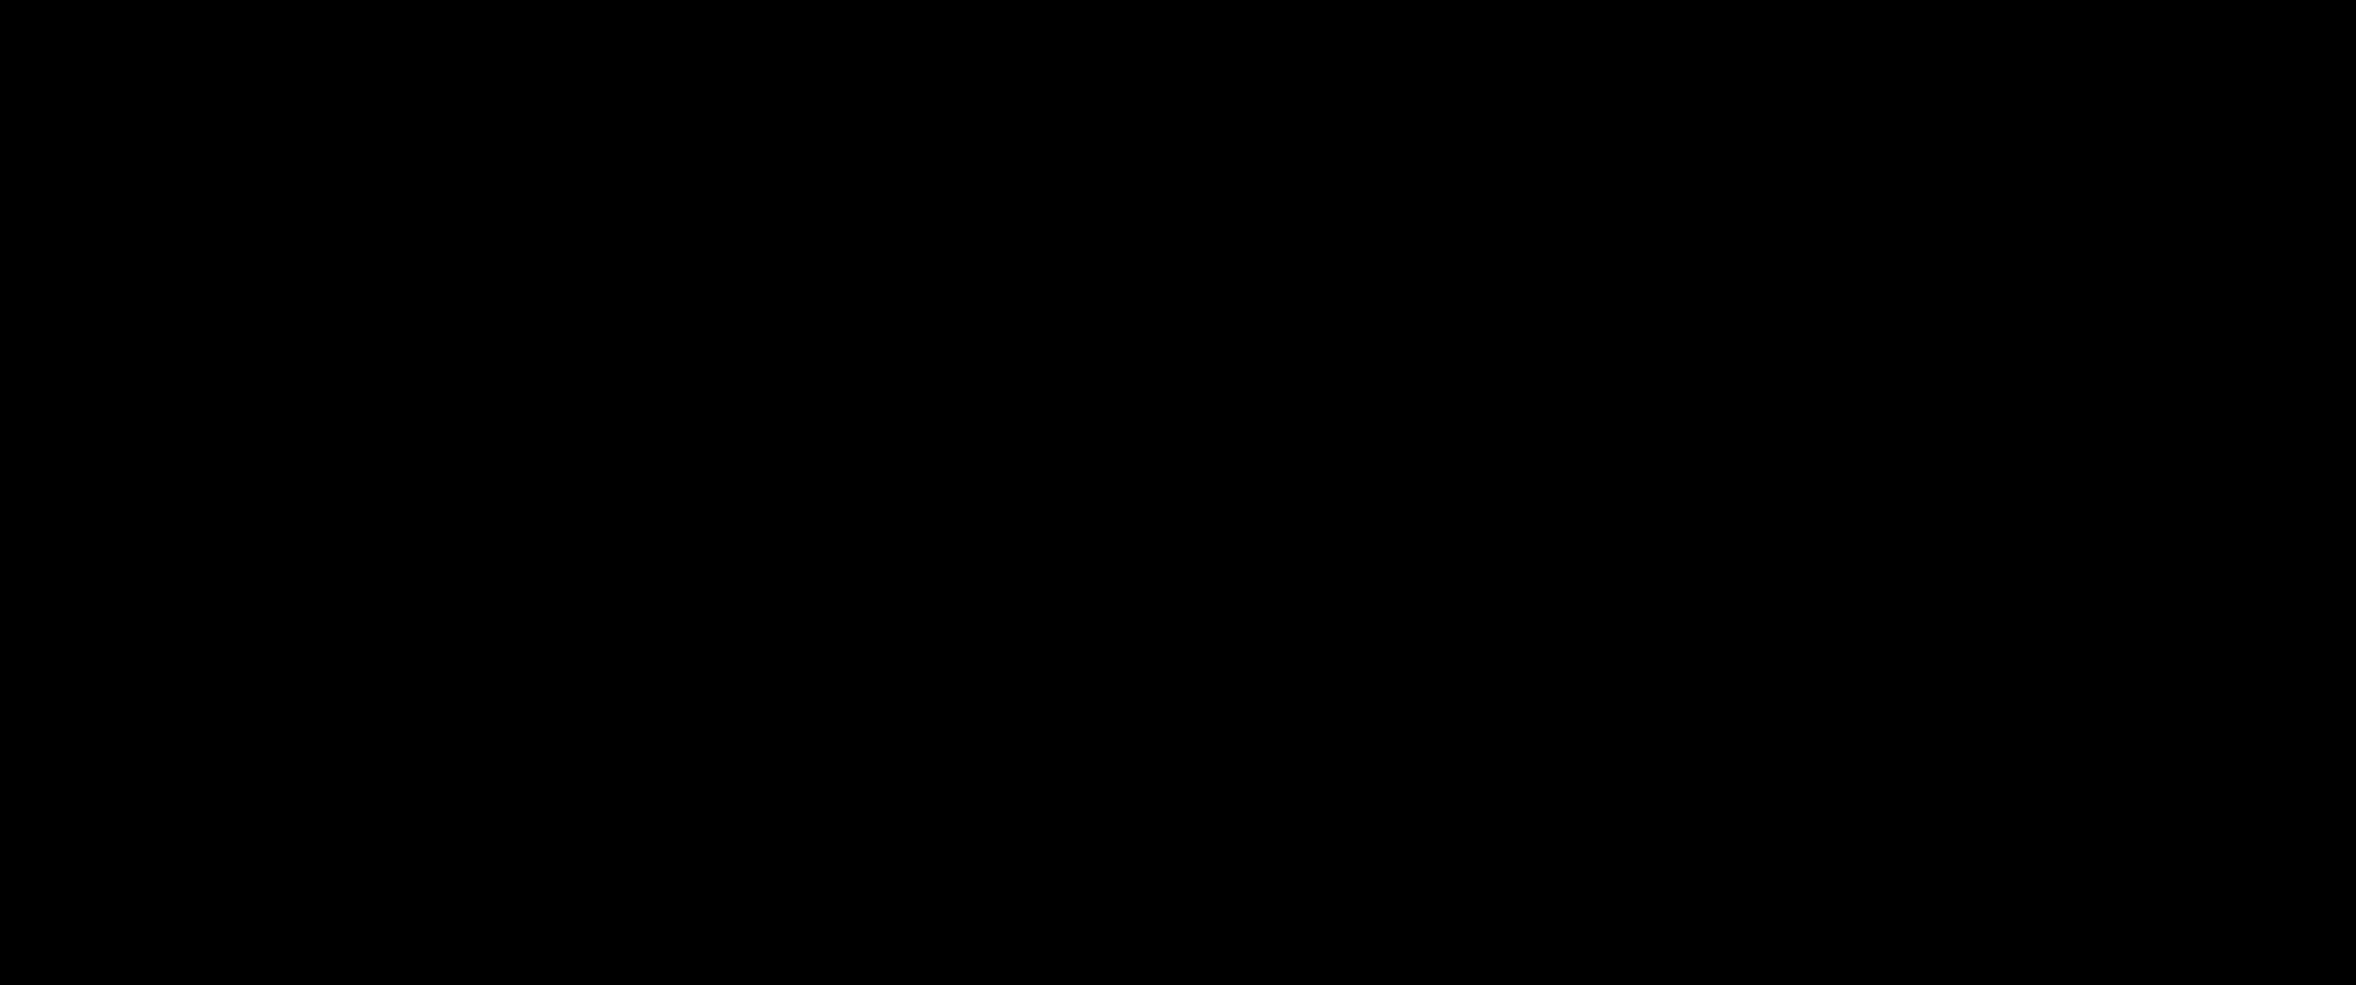 S_003